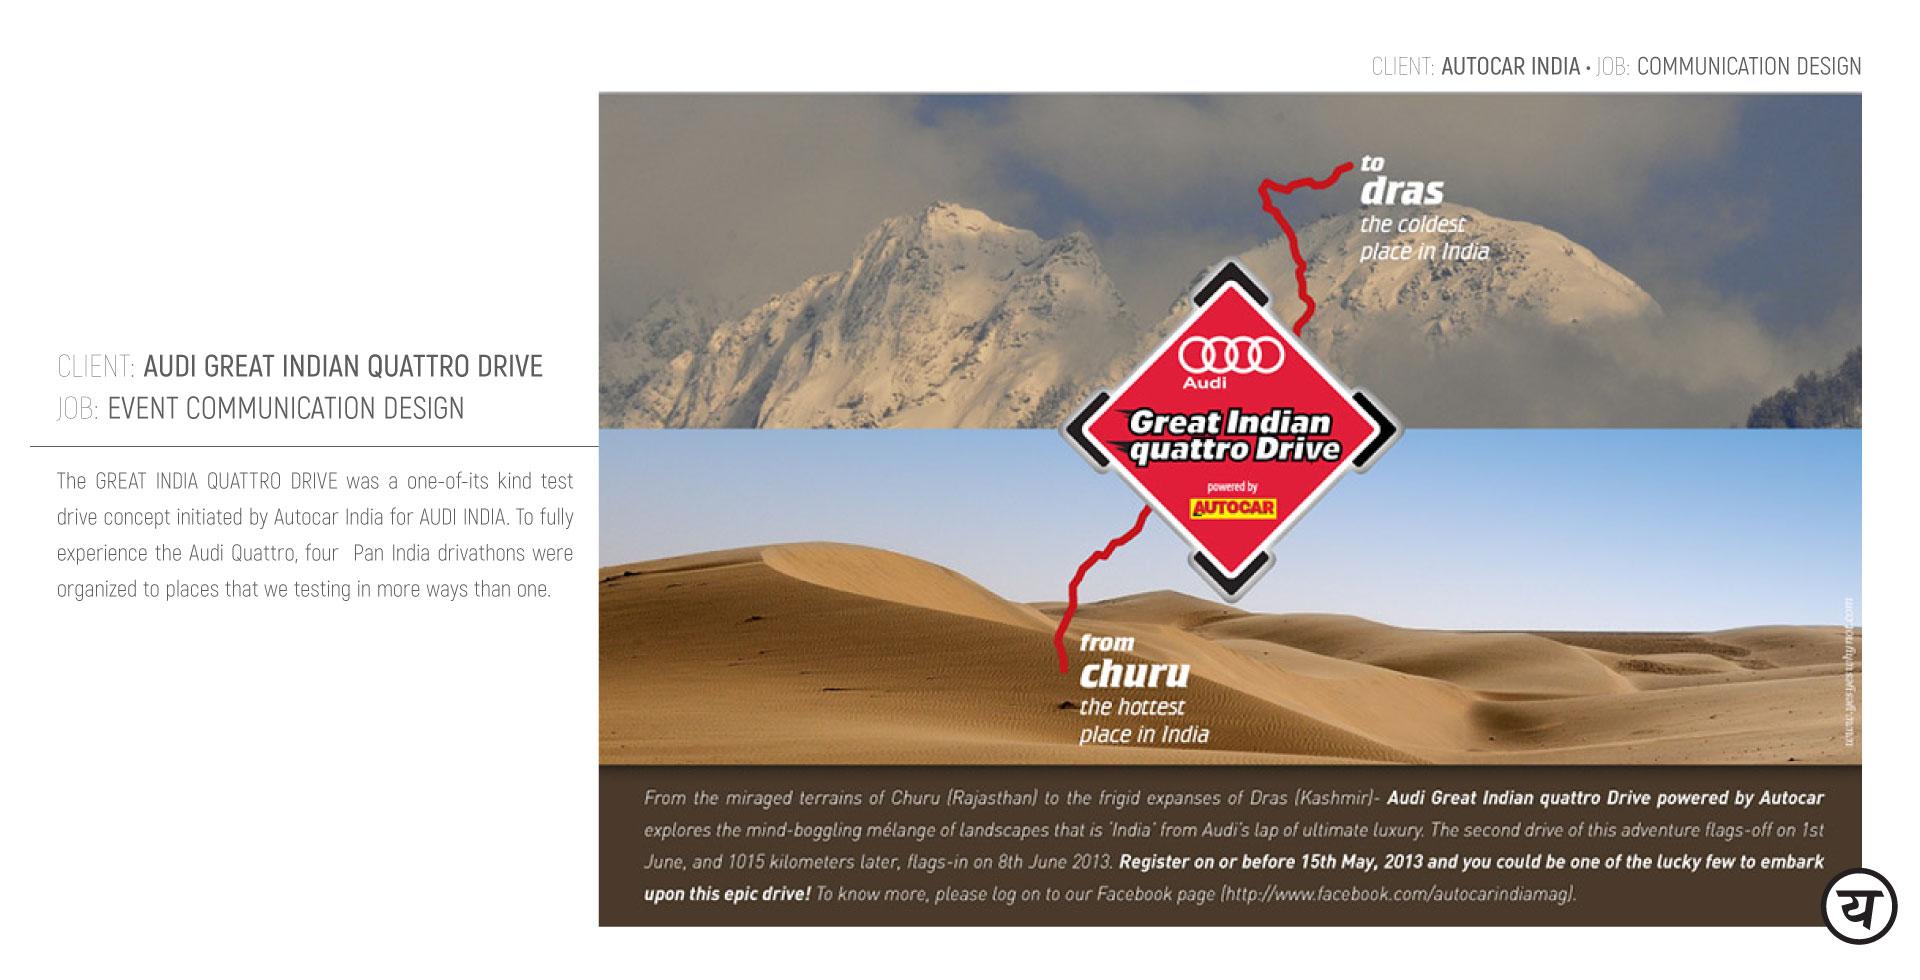 YesYesWhyNot_Communication-Design_Haymarket-#3_04.08.19